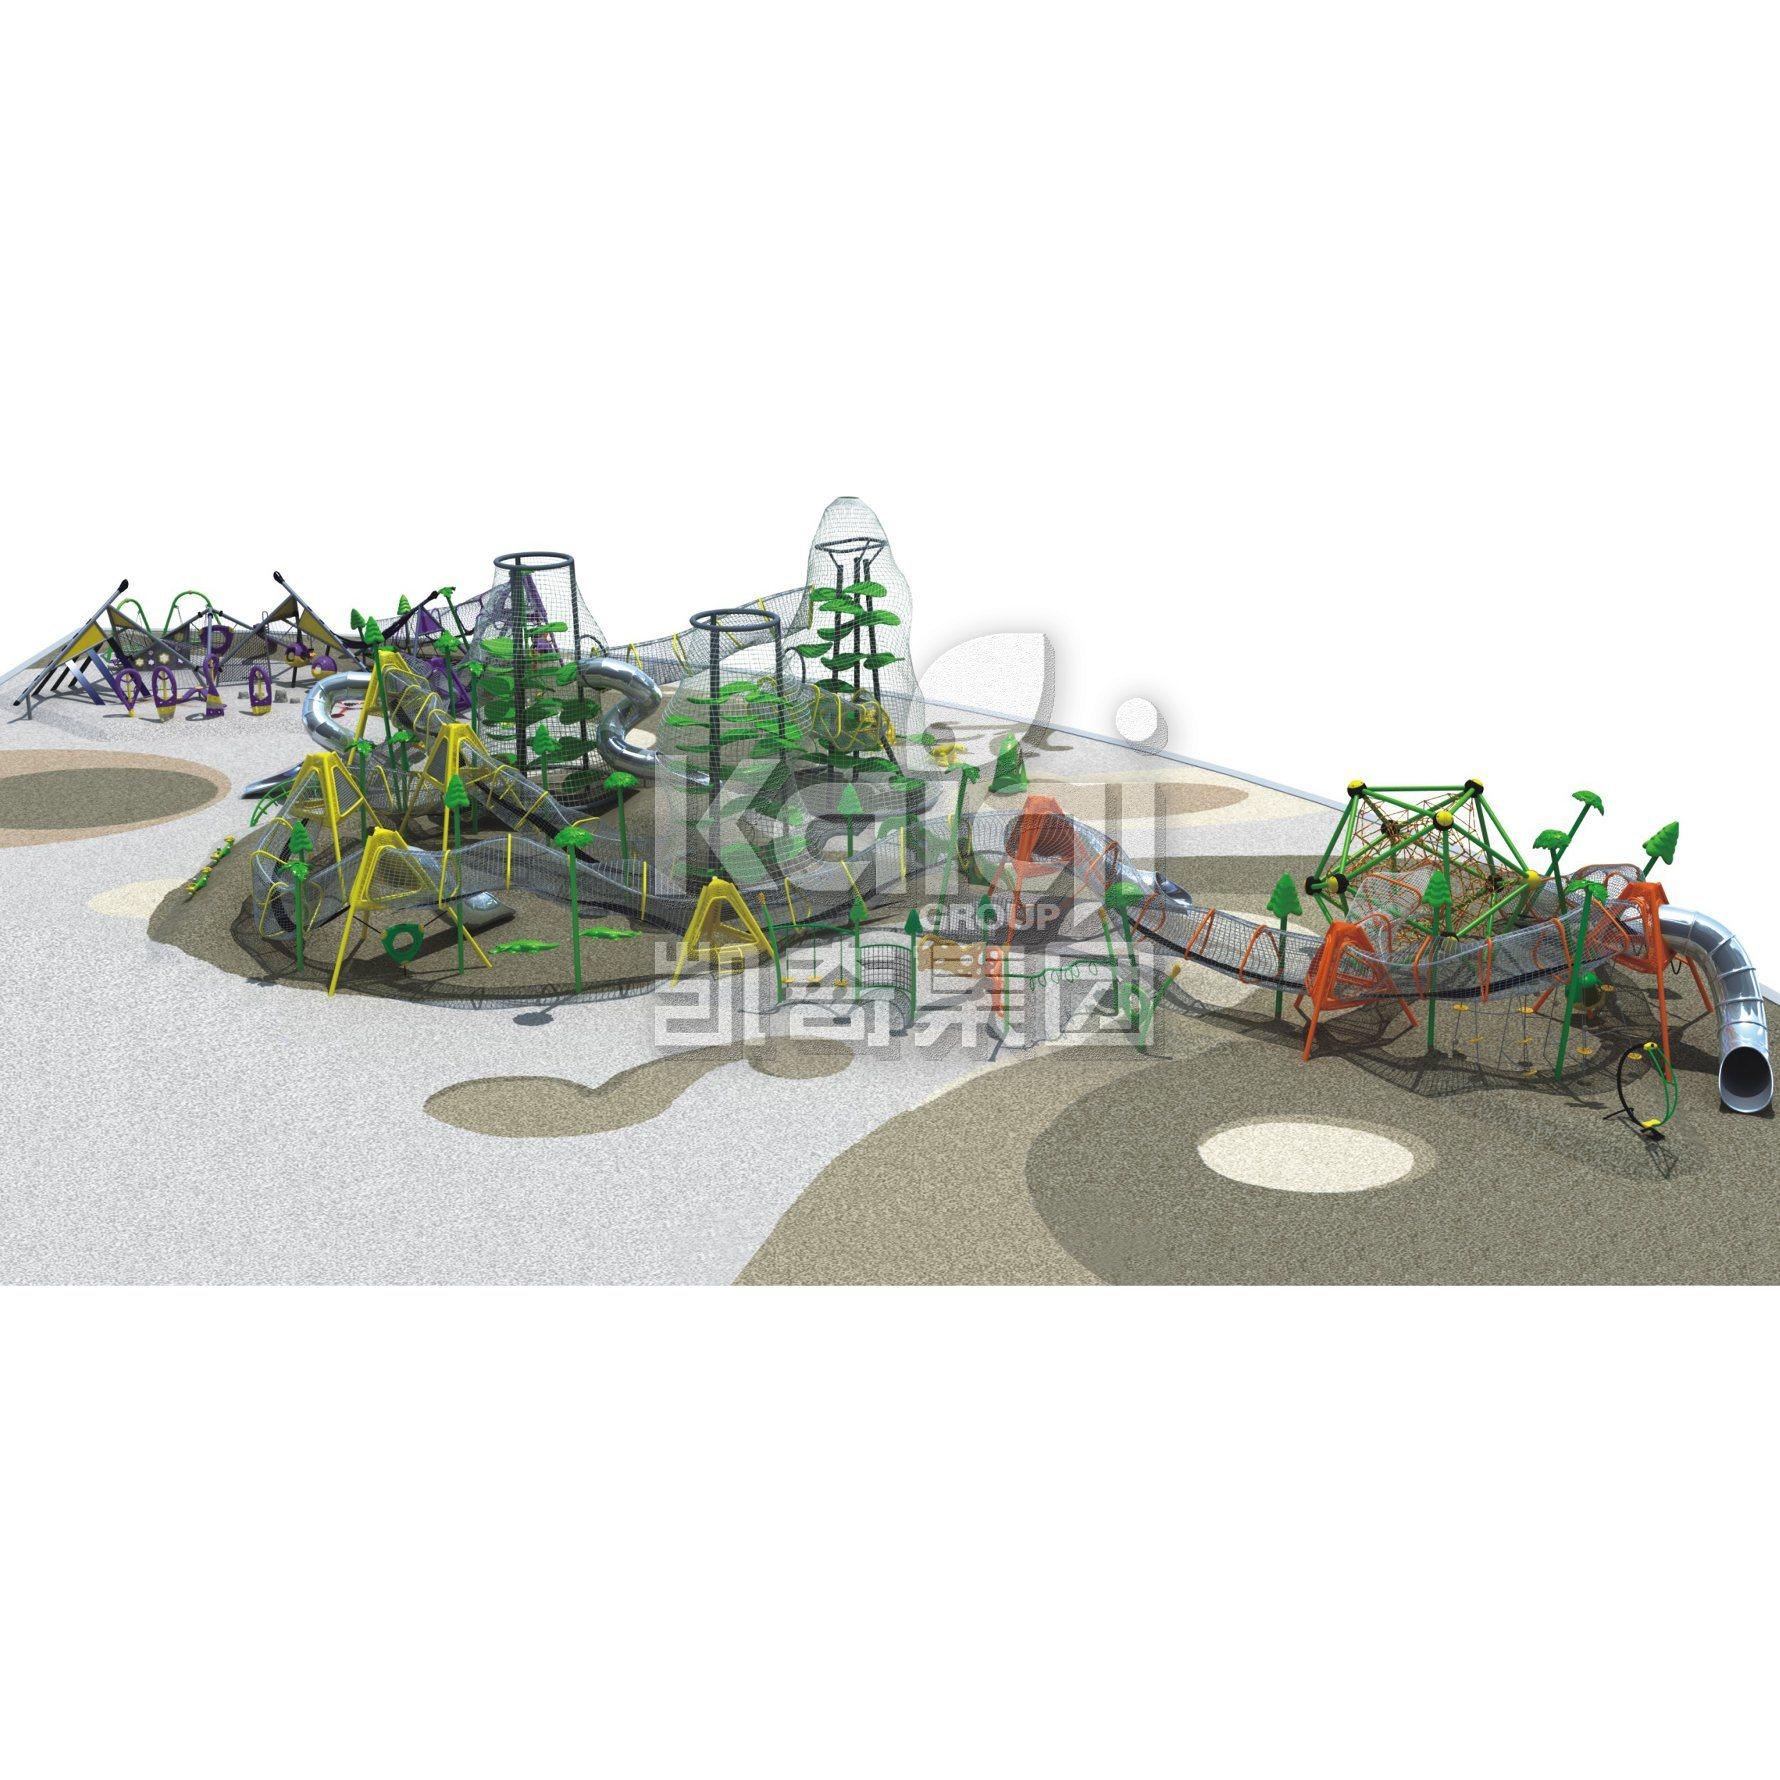 China Outdoor Adventure Park Equipment China Outdoor Playground And Amusement Equipment Price